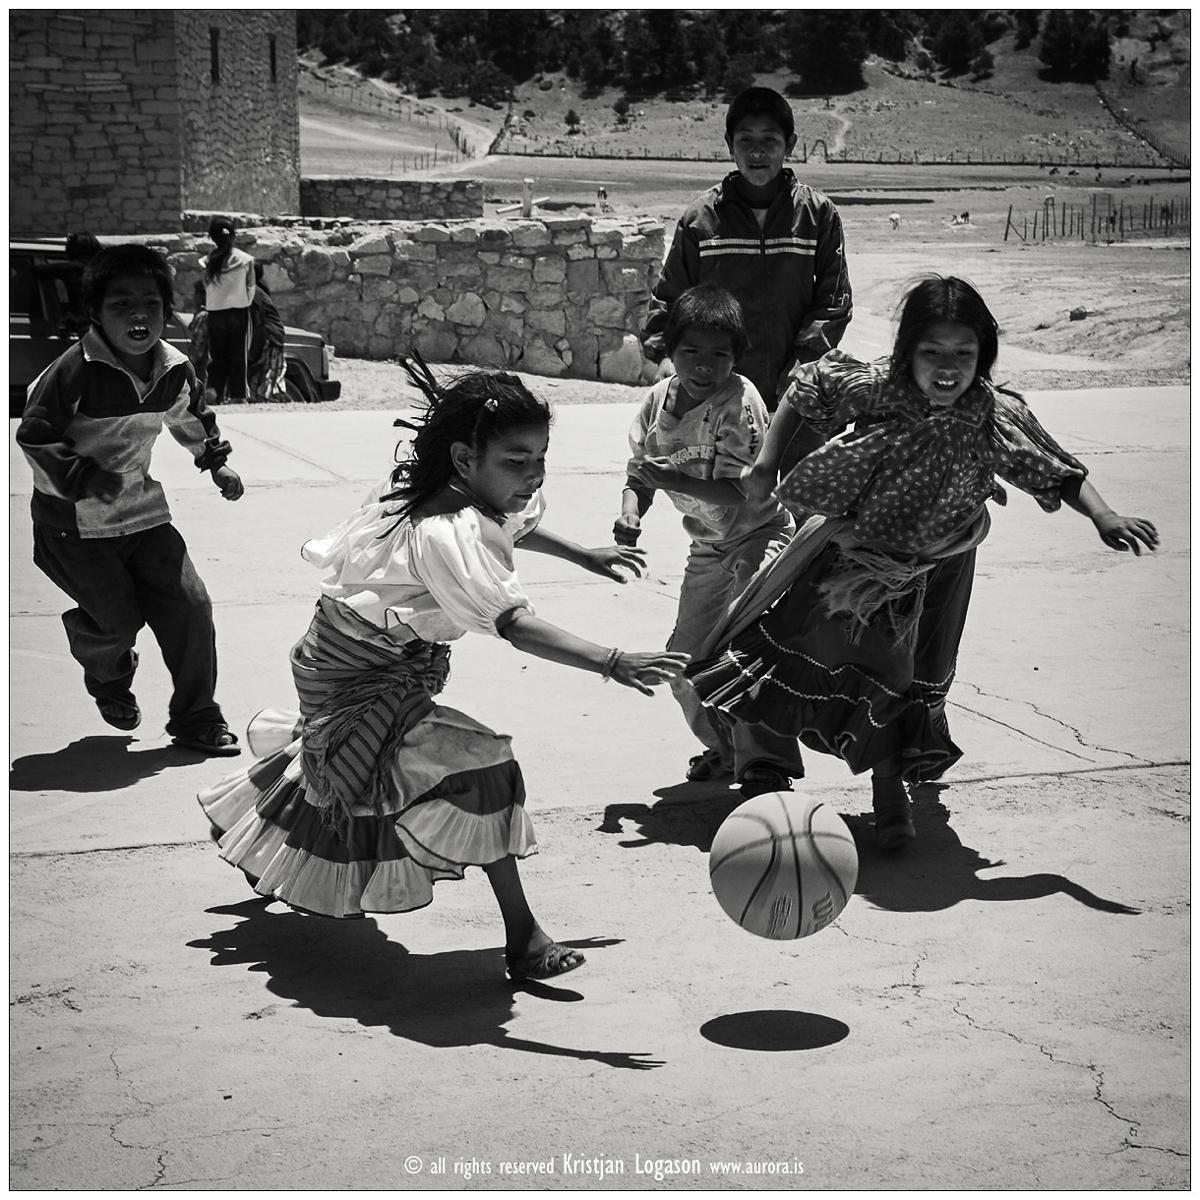 Tamahumara's in basketball